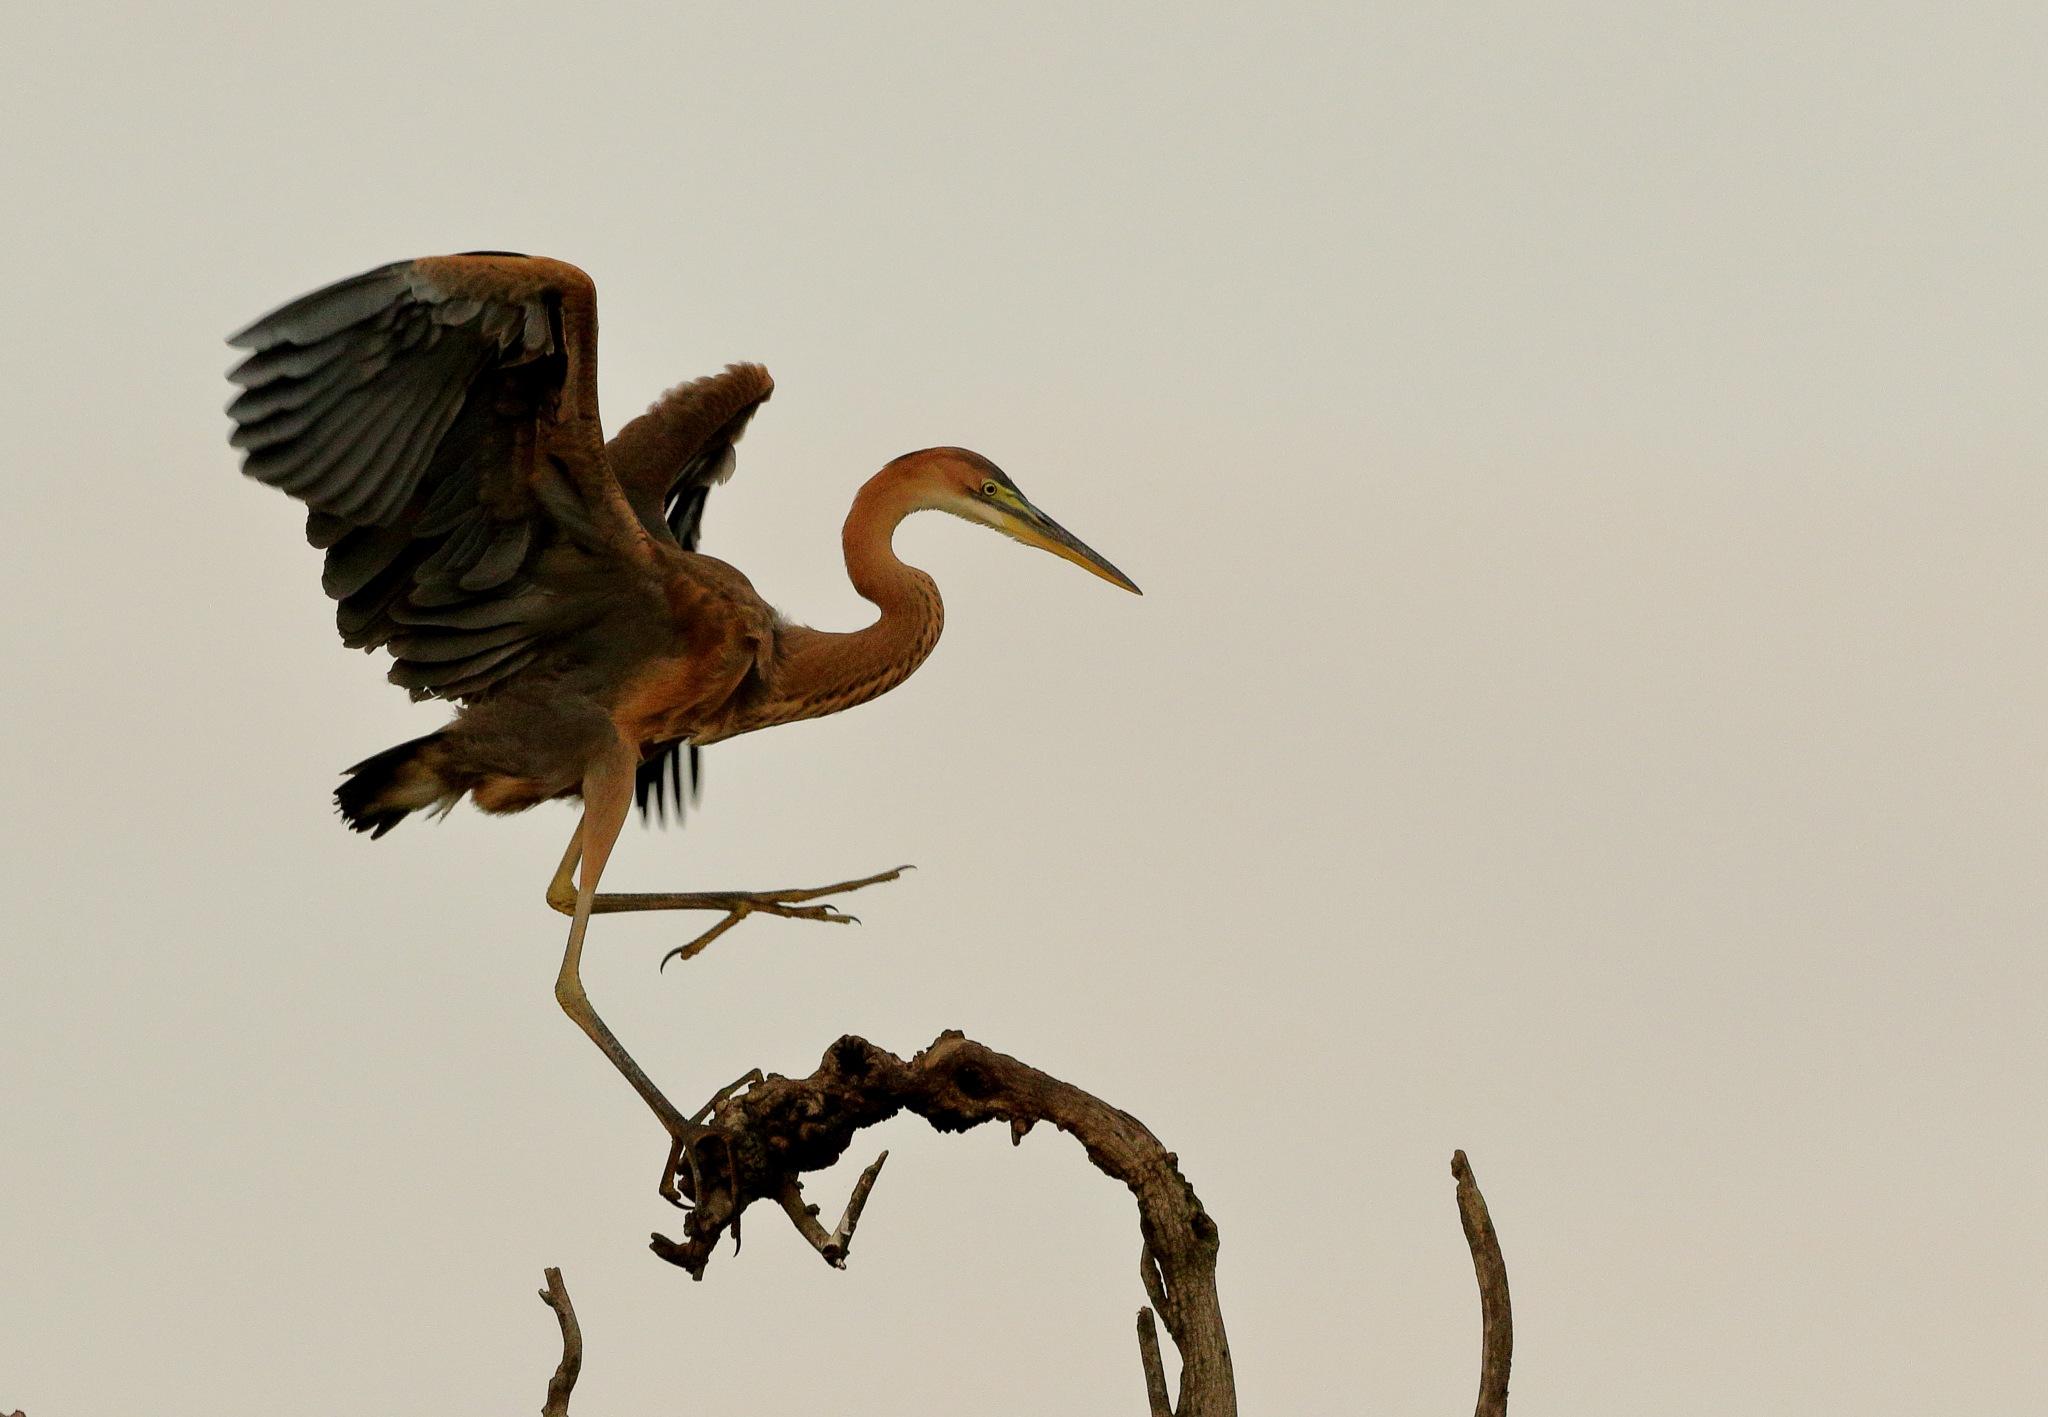 Untitled by R Ramakrishnan